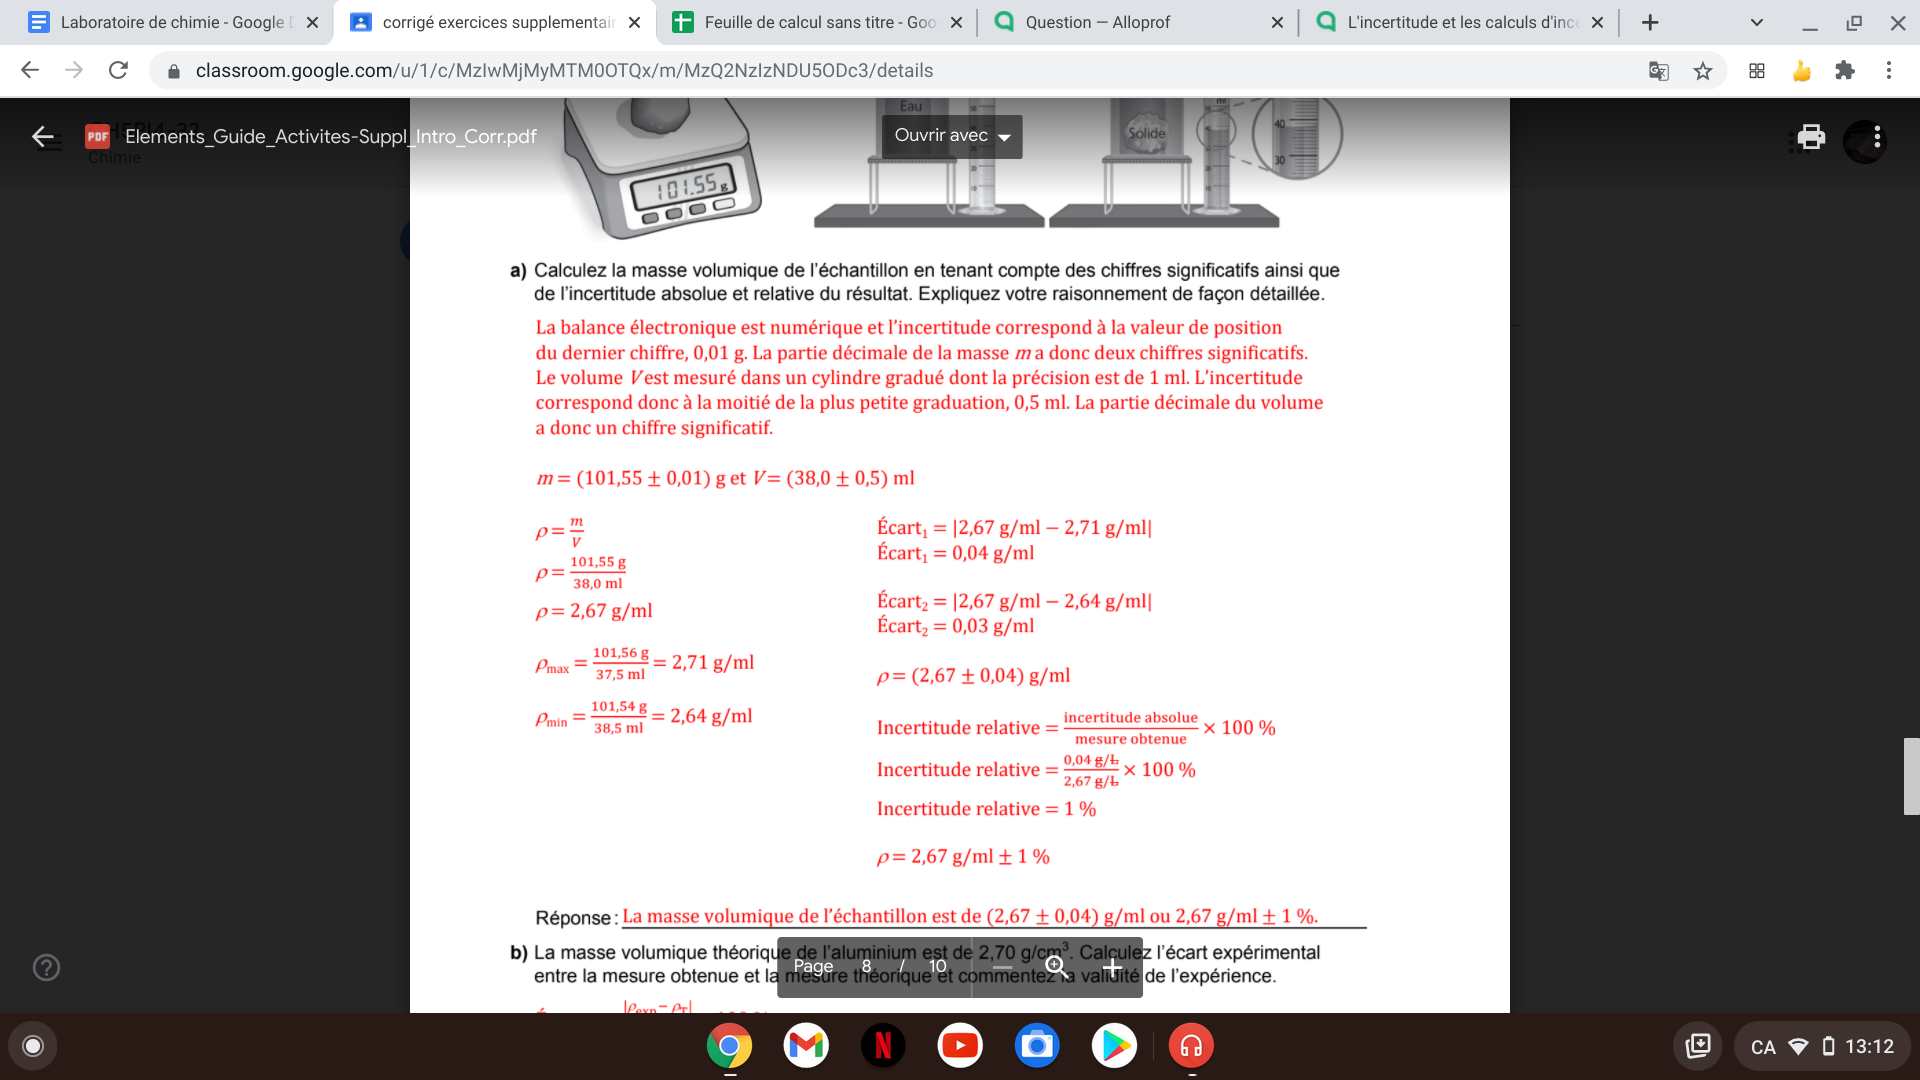 Screenshot 2021-10-17 13.12.09.png